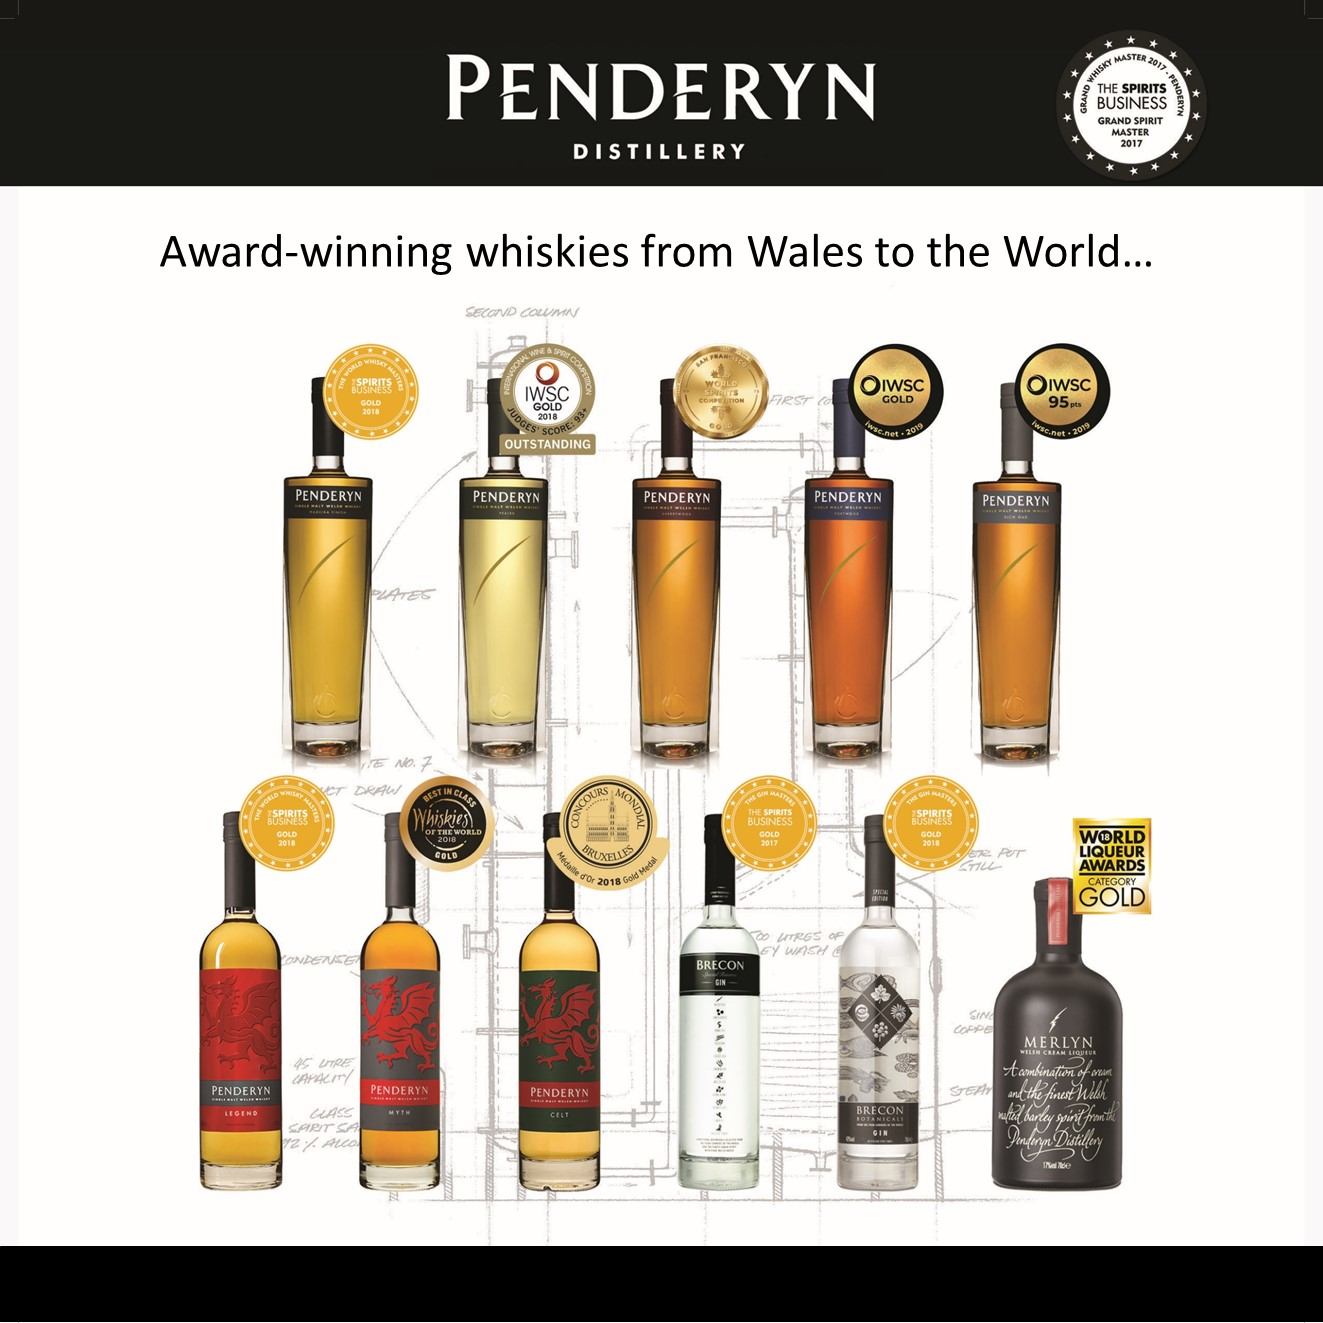 Penderyn Awards